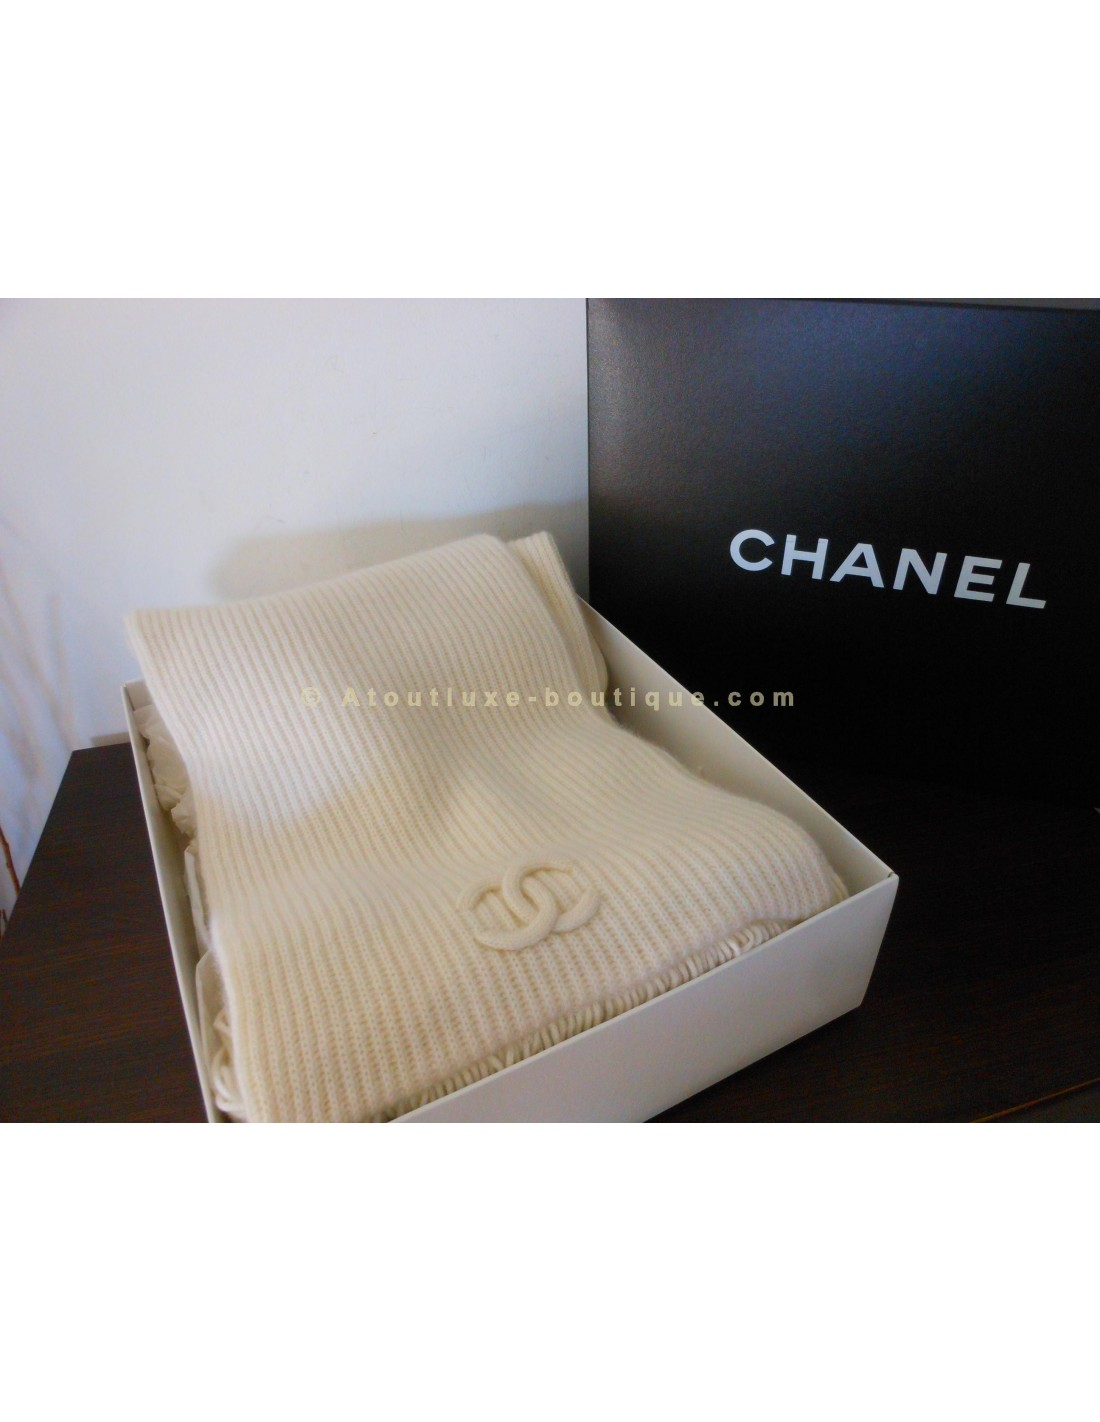 ECHARPE CHANEL CACHEMIRE - Atoutluxe Boutique 524d208e254